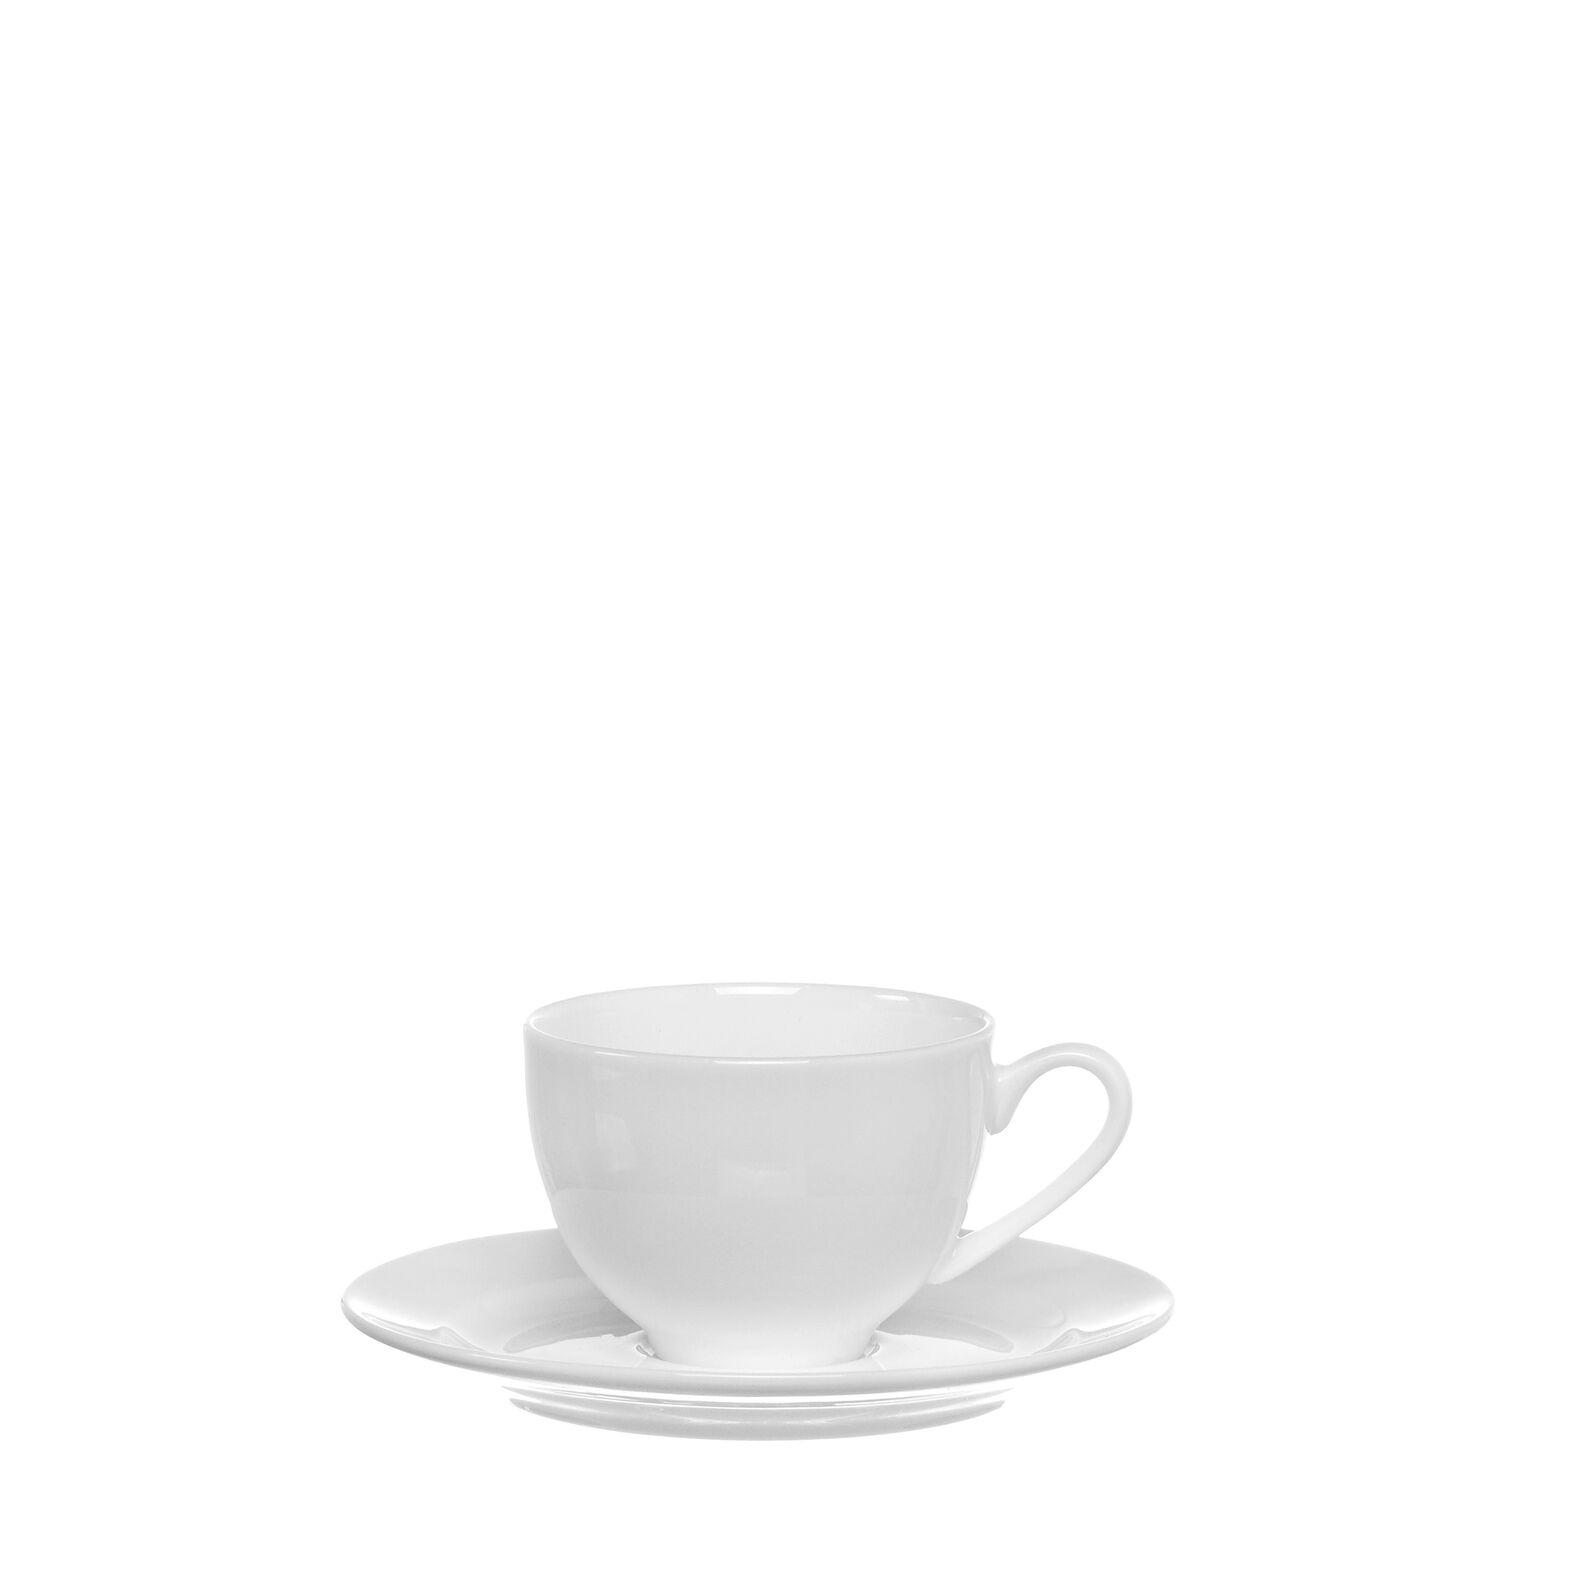 Bitossi Tazzina caffè Veronica